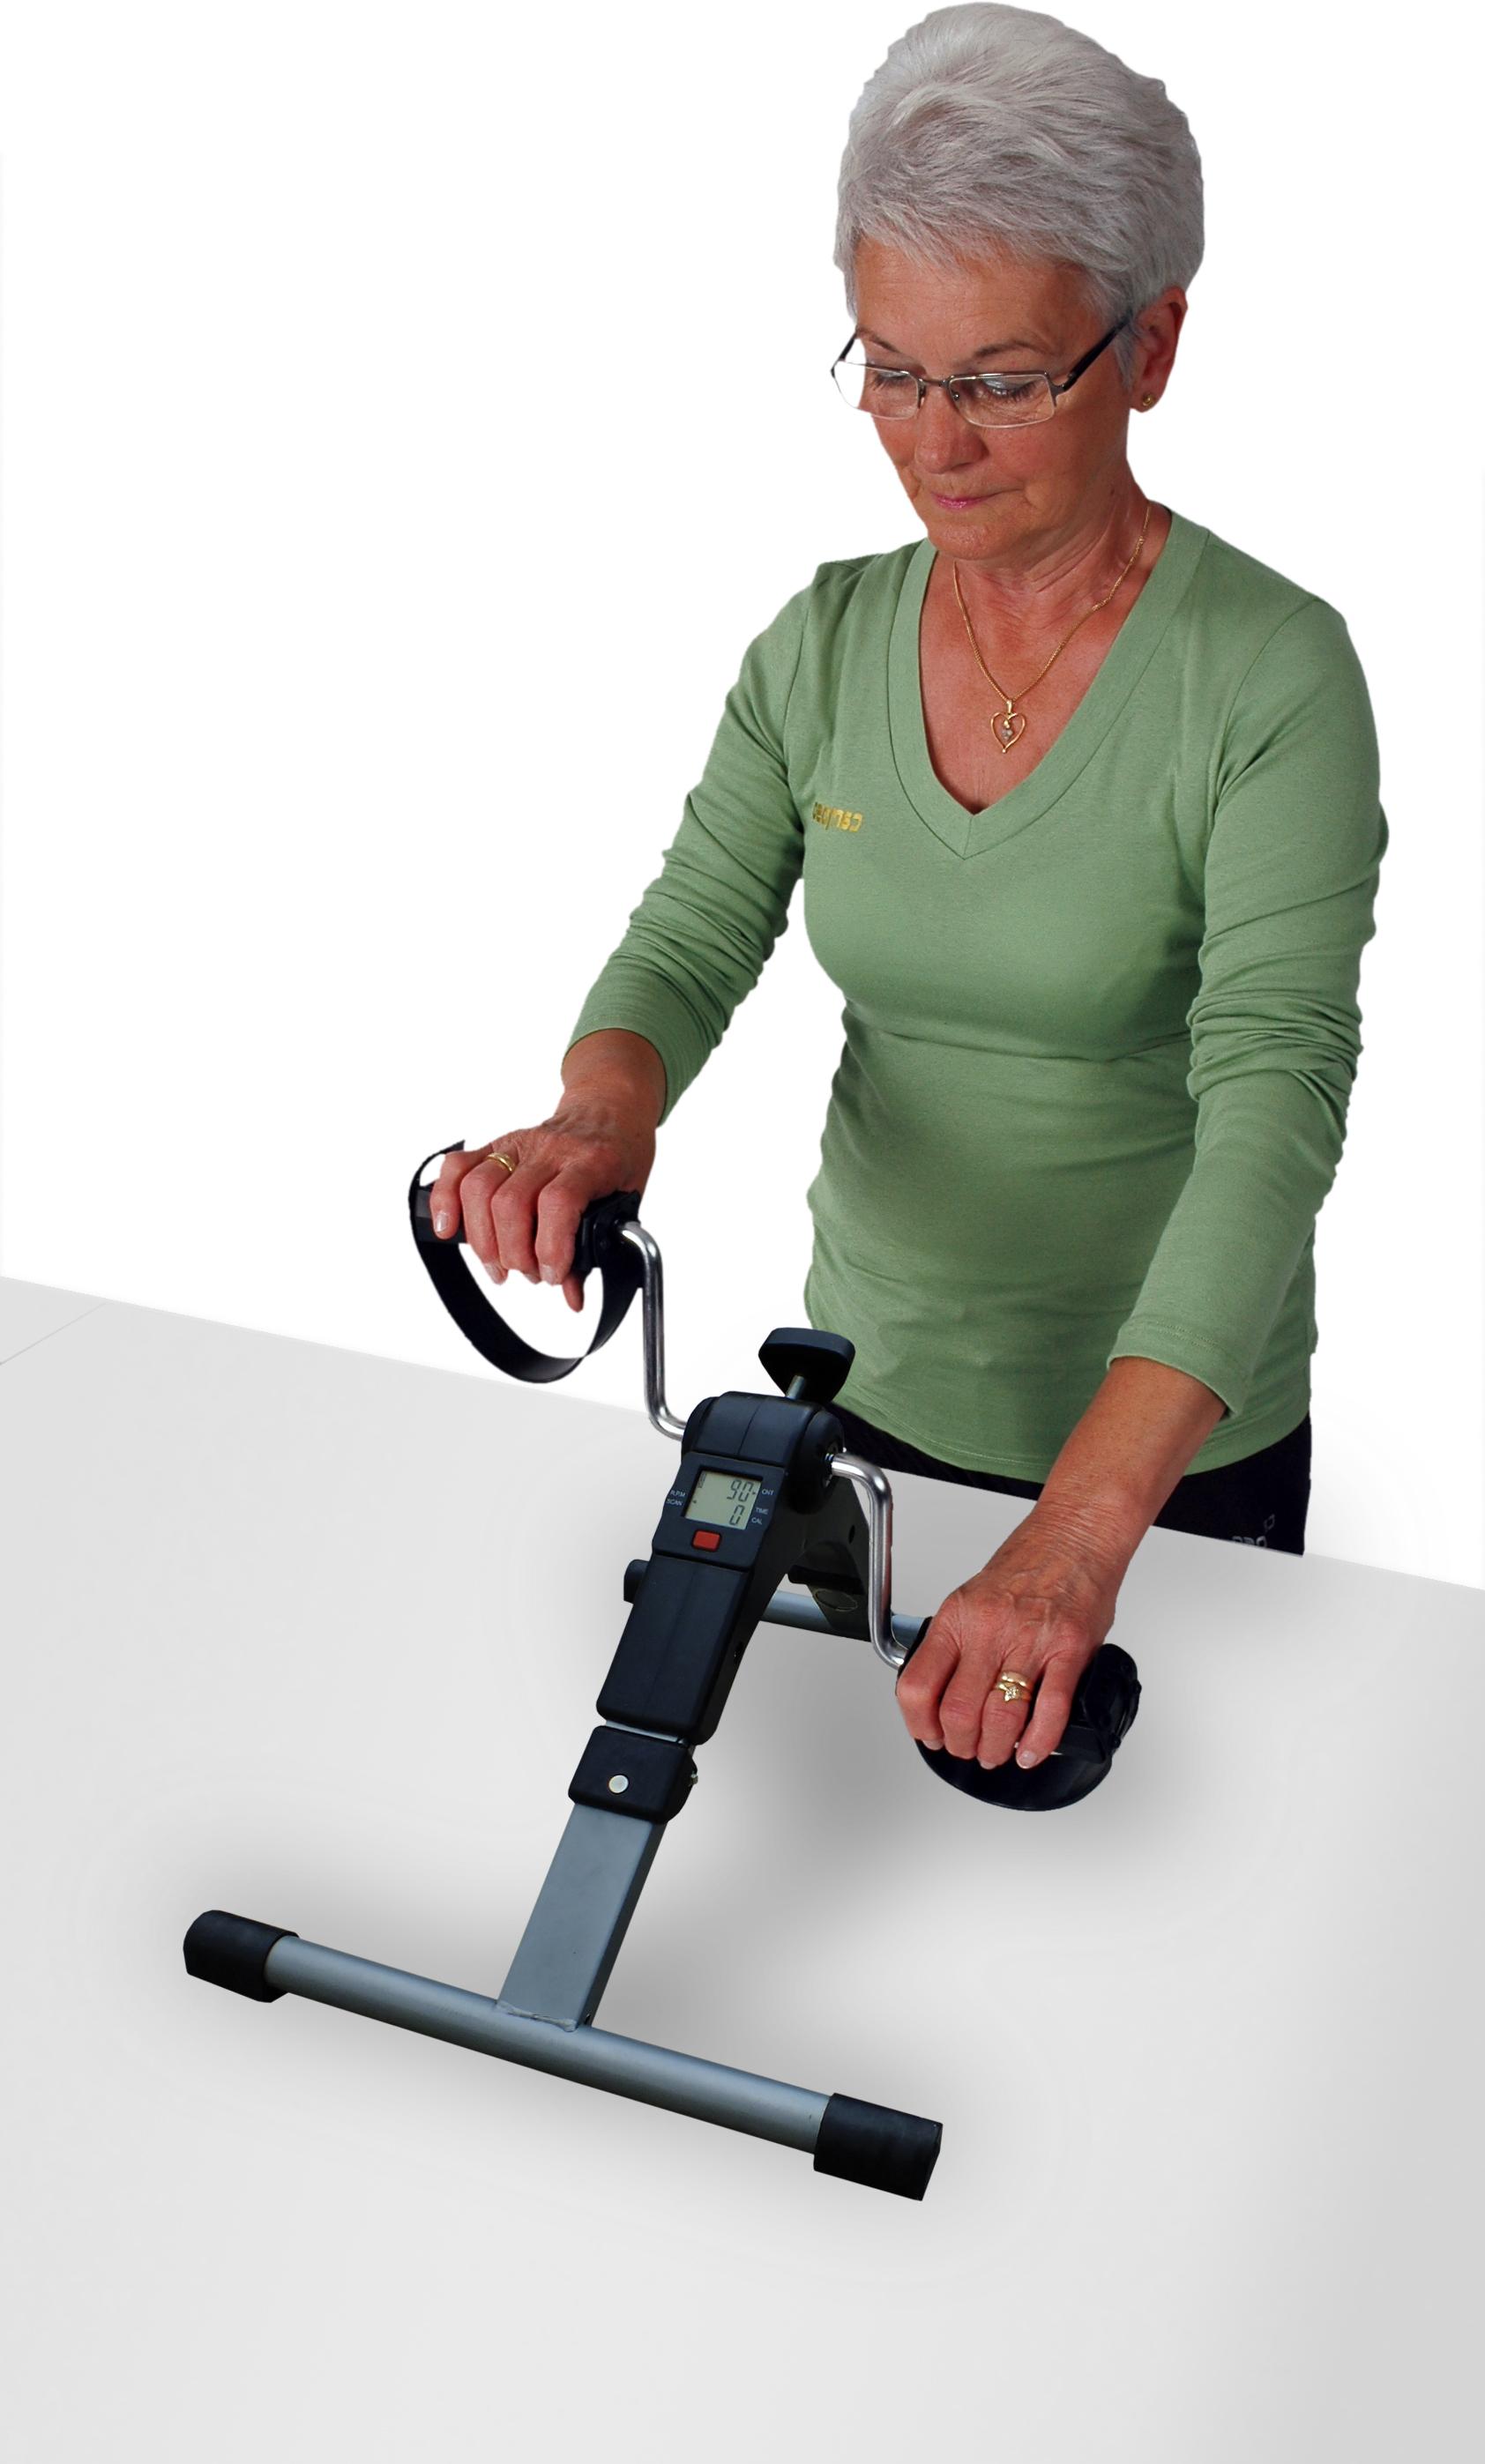 MoVeS Foldable Pedal Exerciser 5